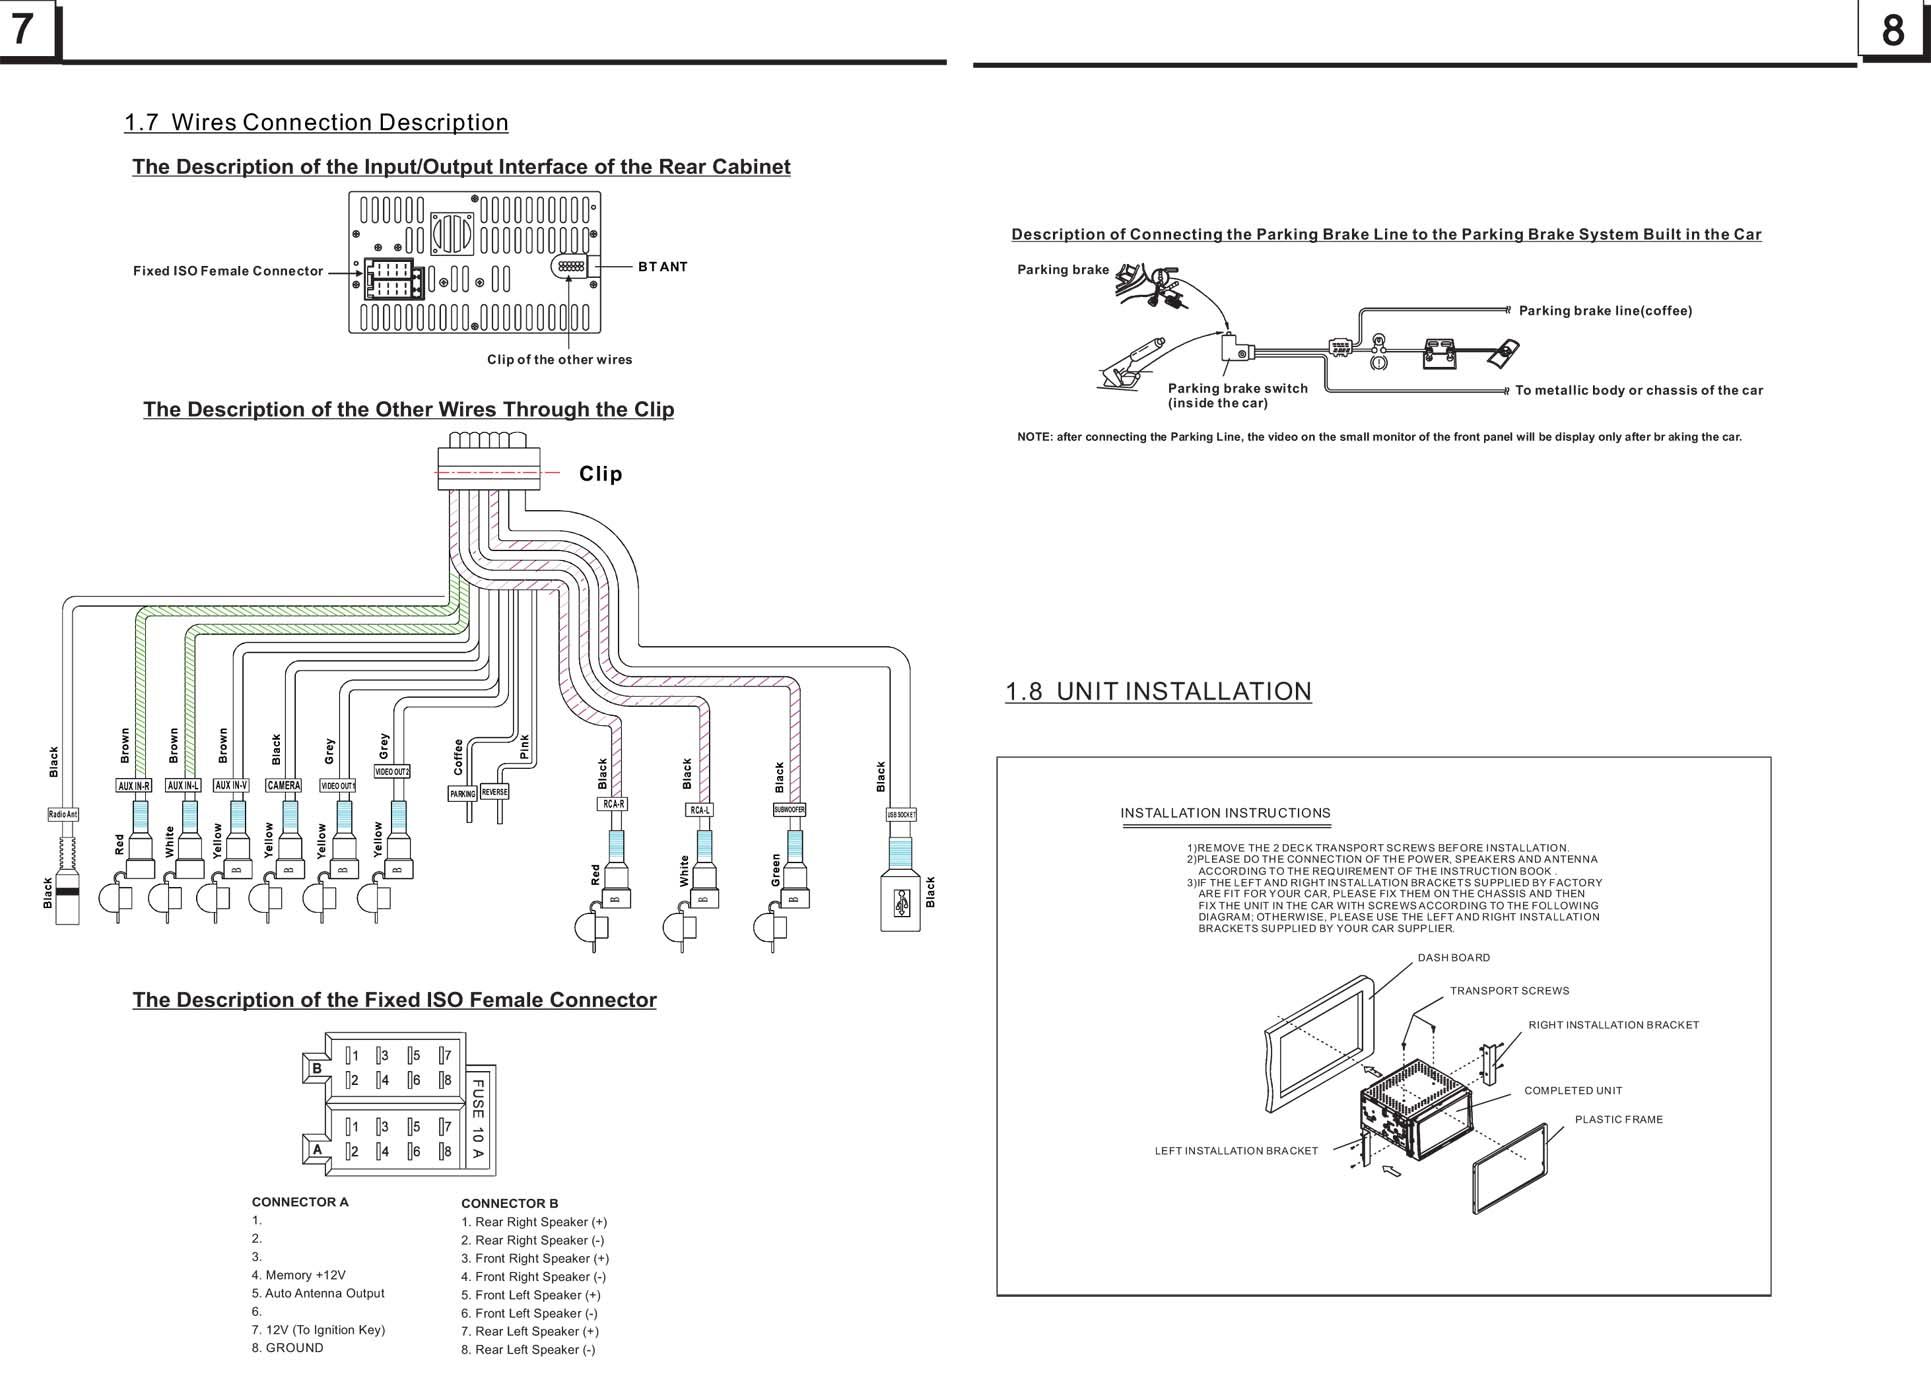 FC_9871] Boss Dvd Player Wire Diagram Free DiagramIosto Phon Emba Mohammedshrine Librar Wiring 101